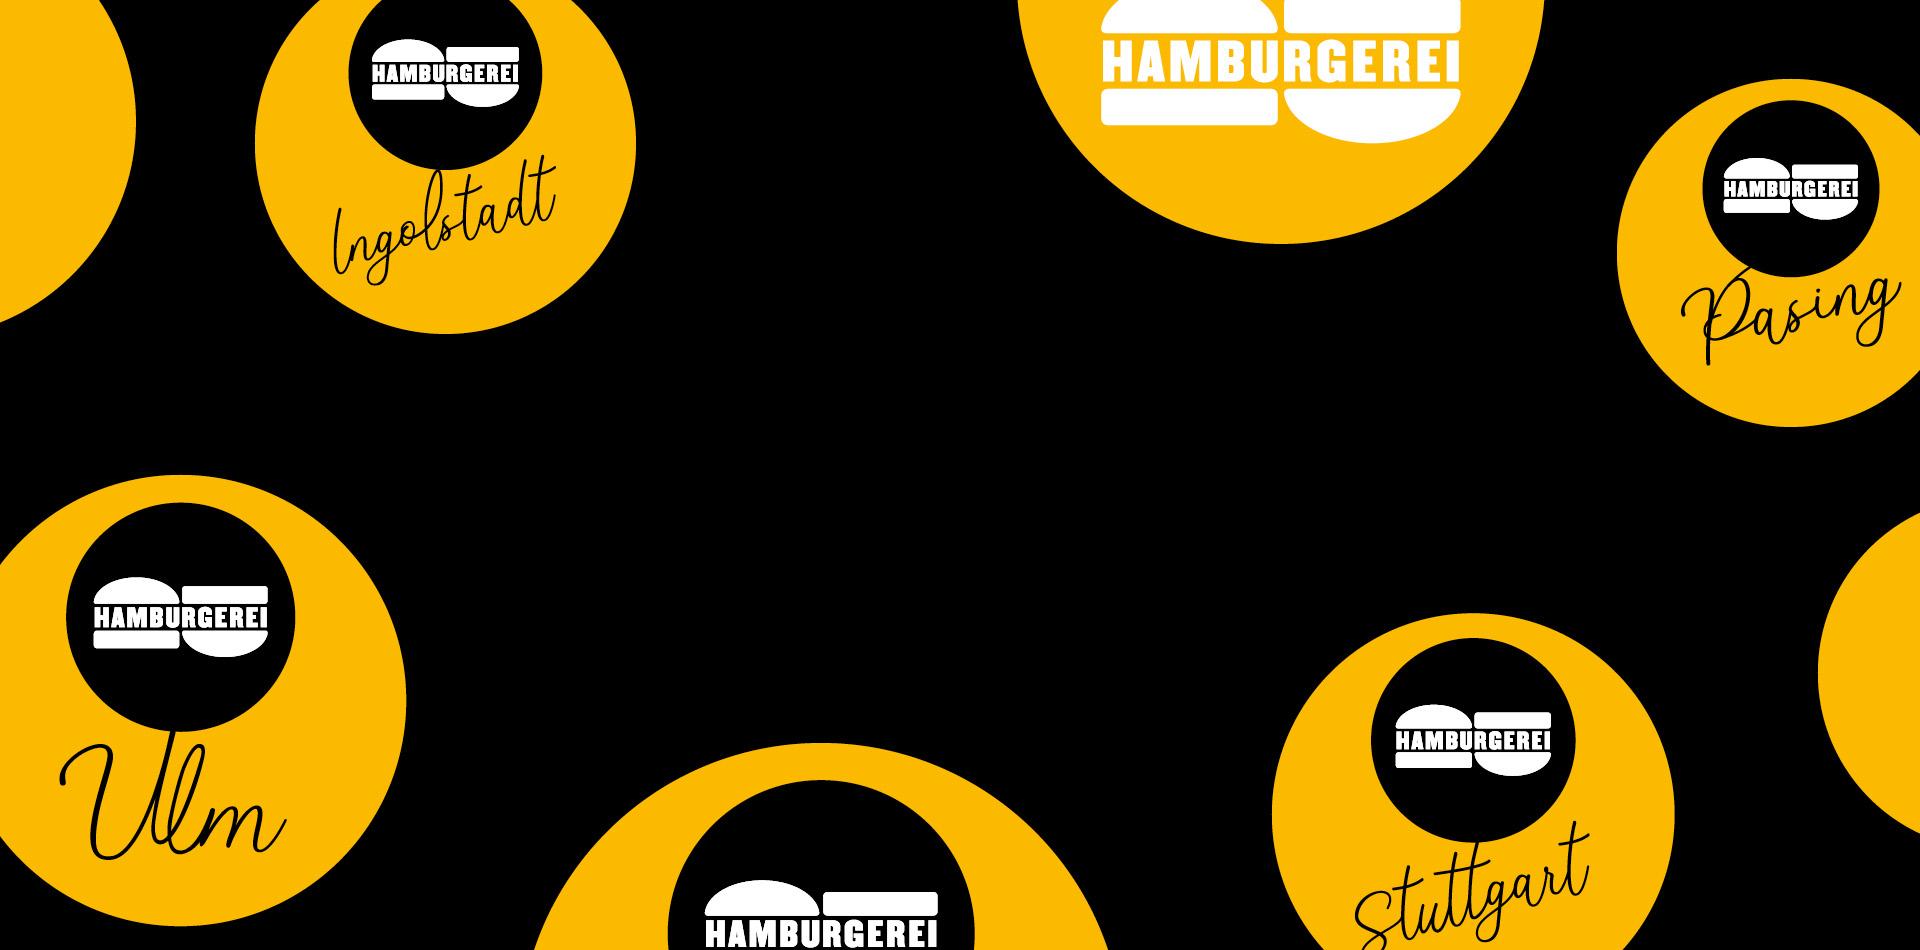 Hamburgerei Franchisenehmer